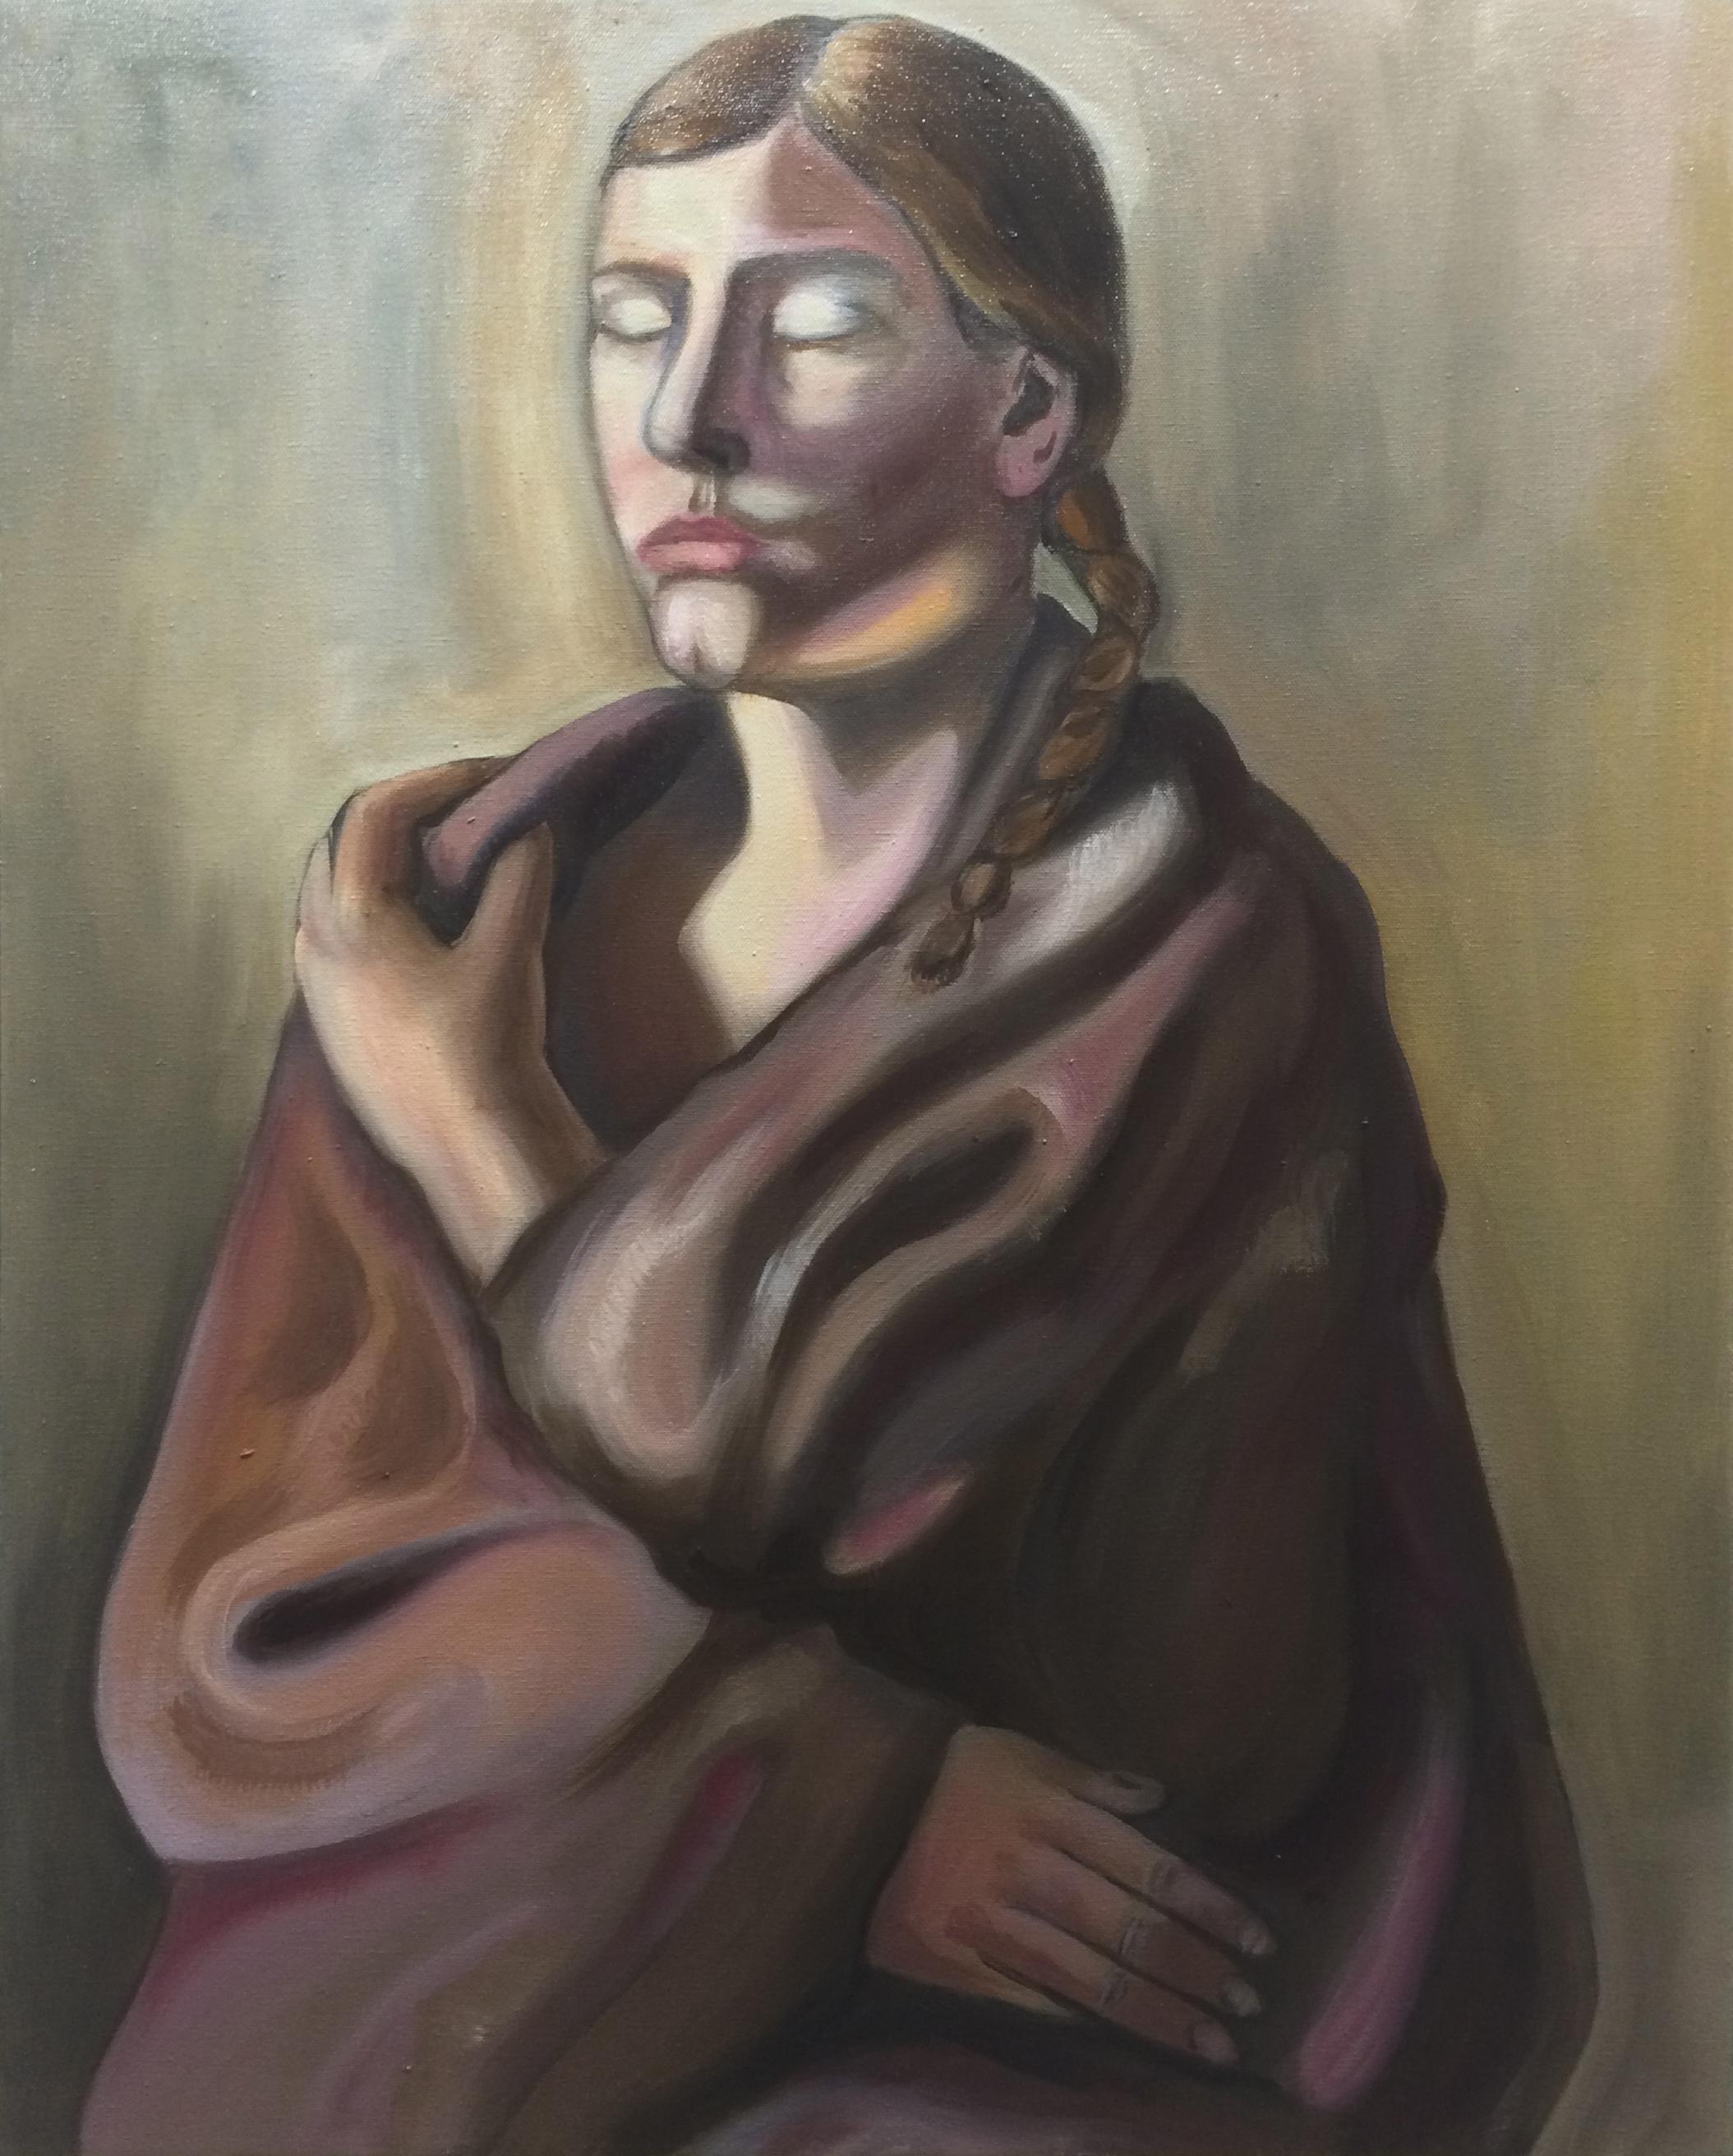 Meditations (St. Kateri Tekakwitha)